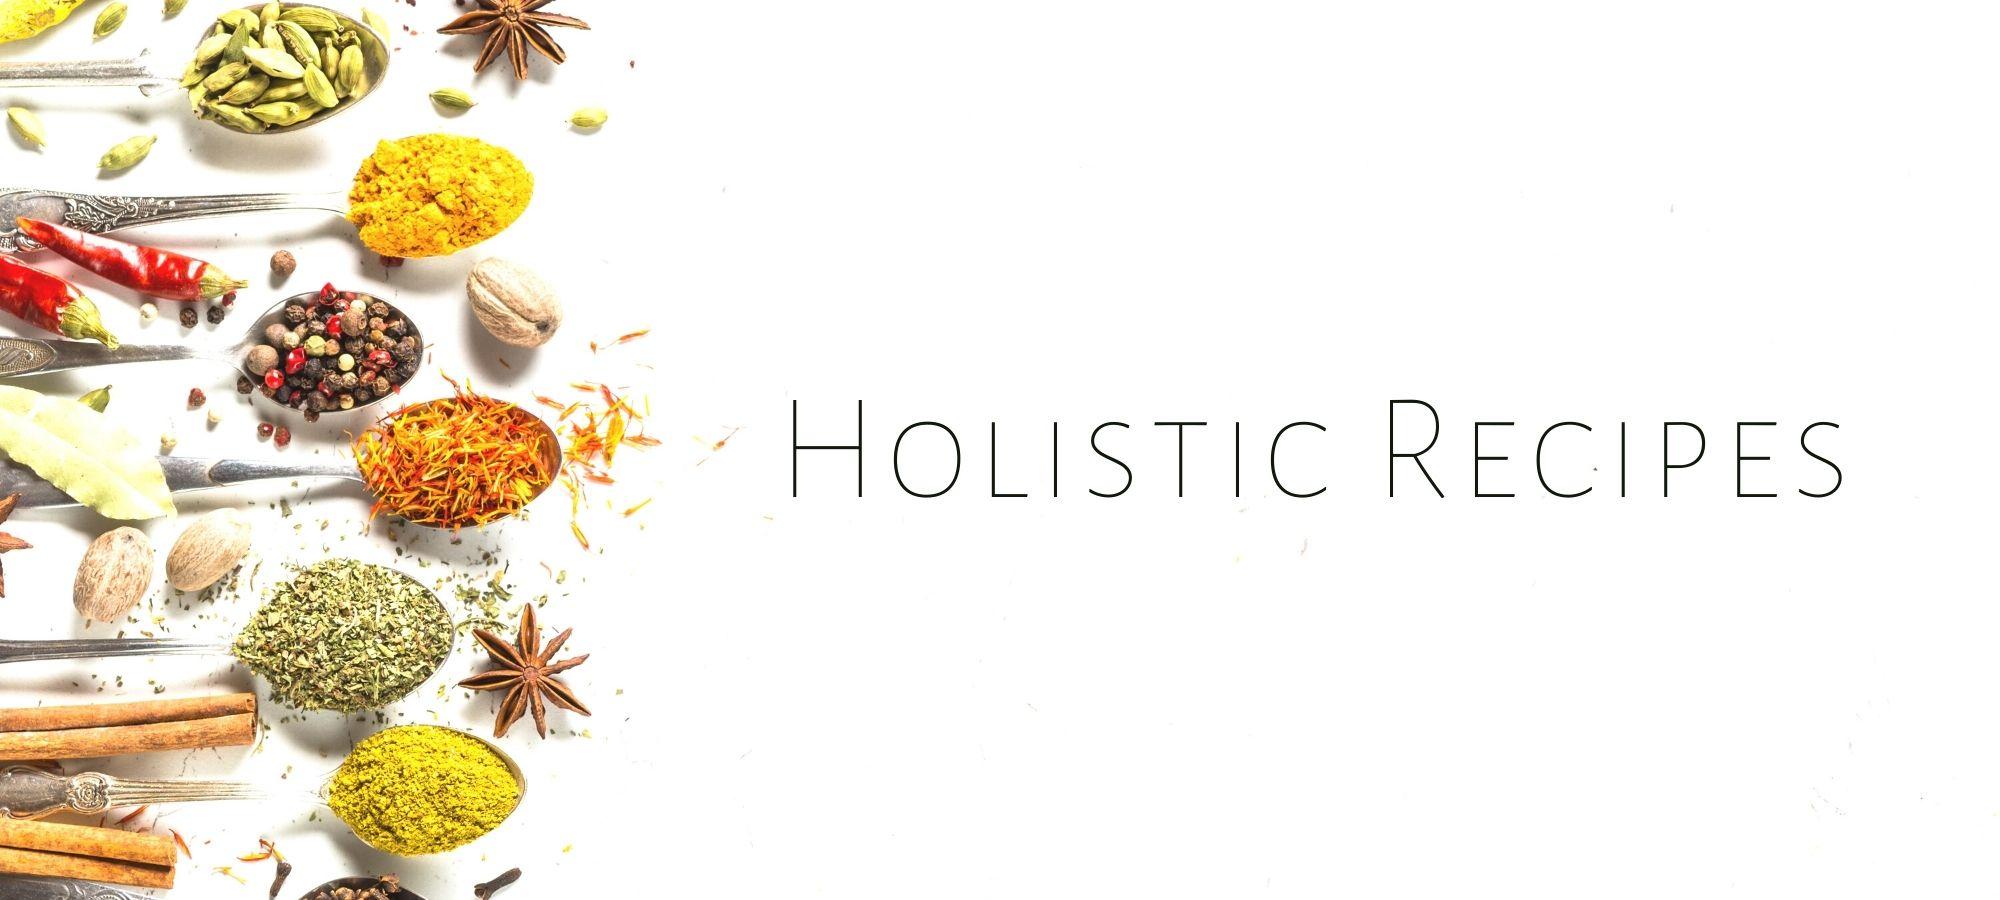 Holistic Recipes